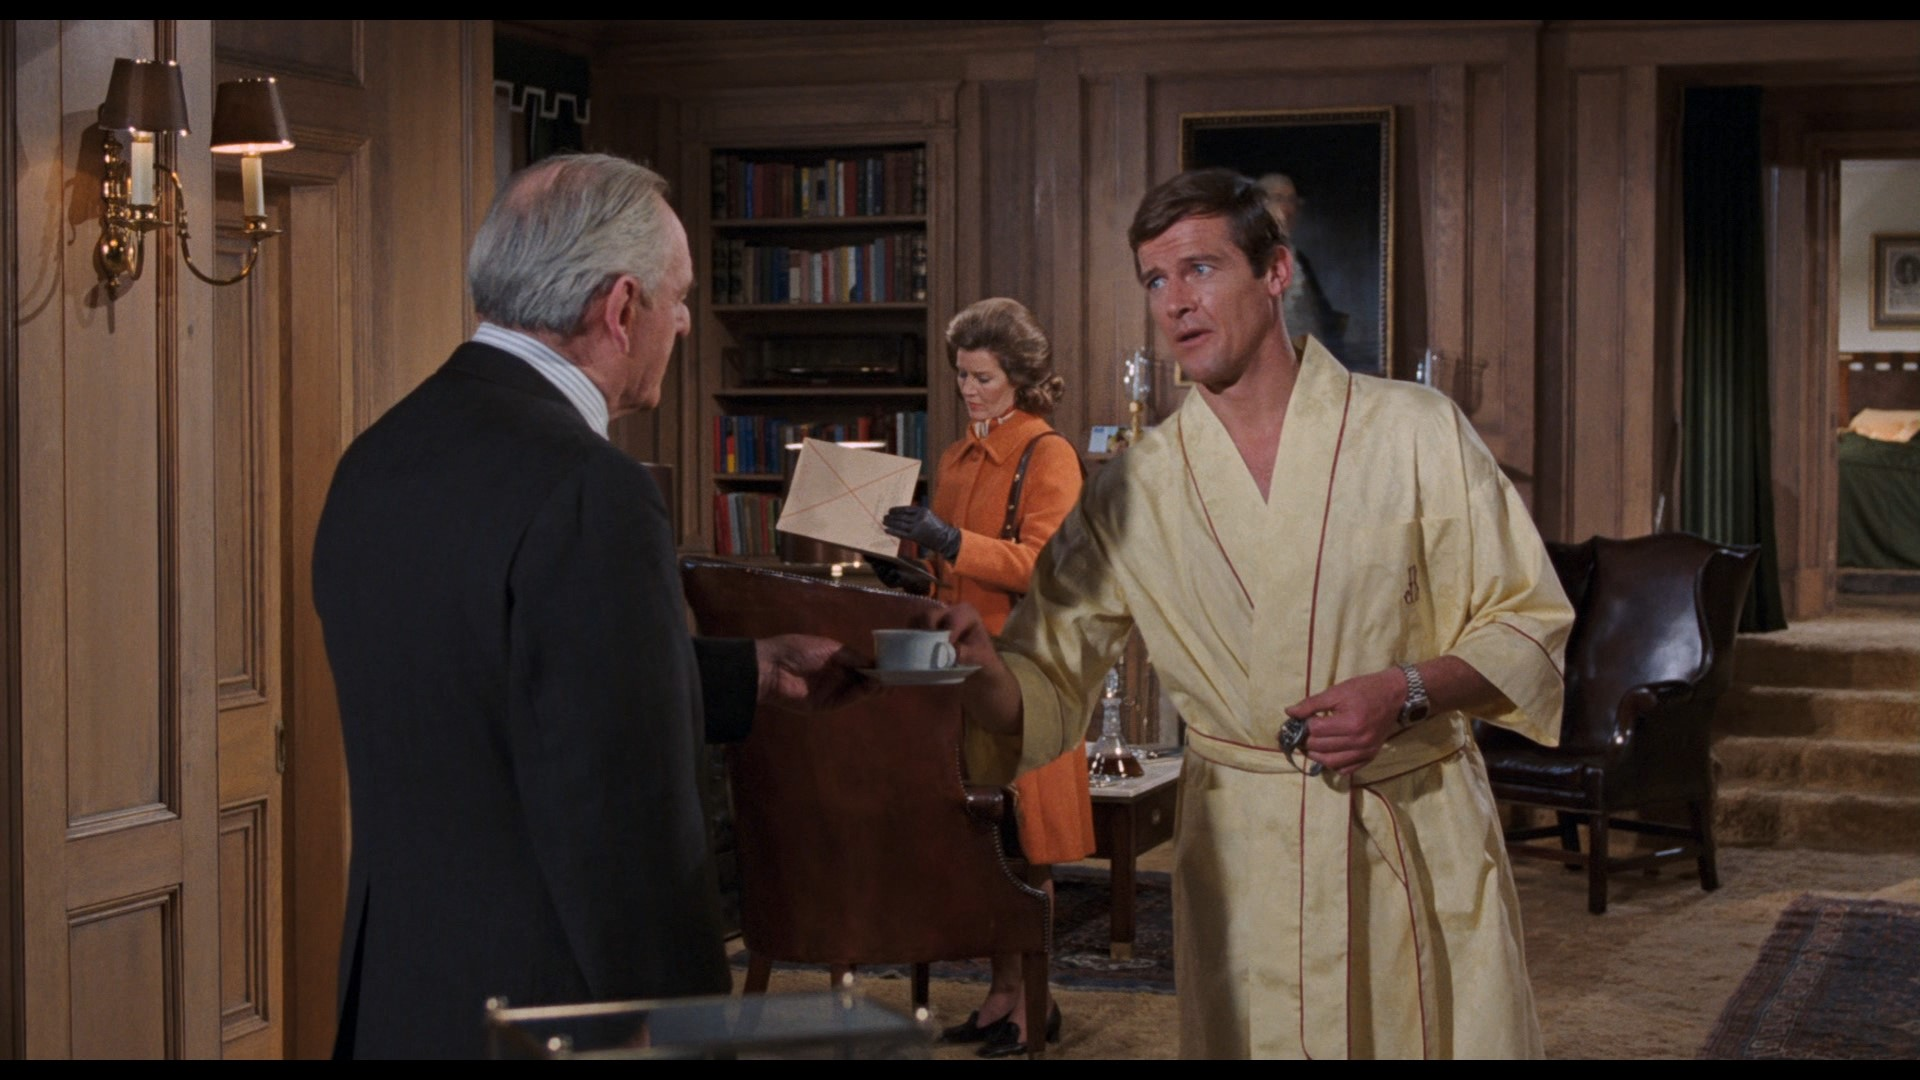 JAMES BOND: LIVE AND LET DIE (1973) - James Bond's (Roger Moore) Hamilton Pulsar Watch, On-set Photo - Image 13 of 13